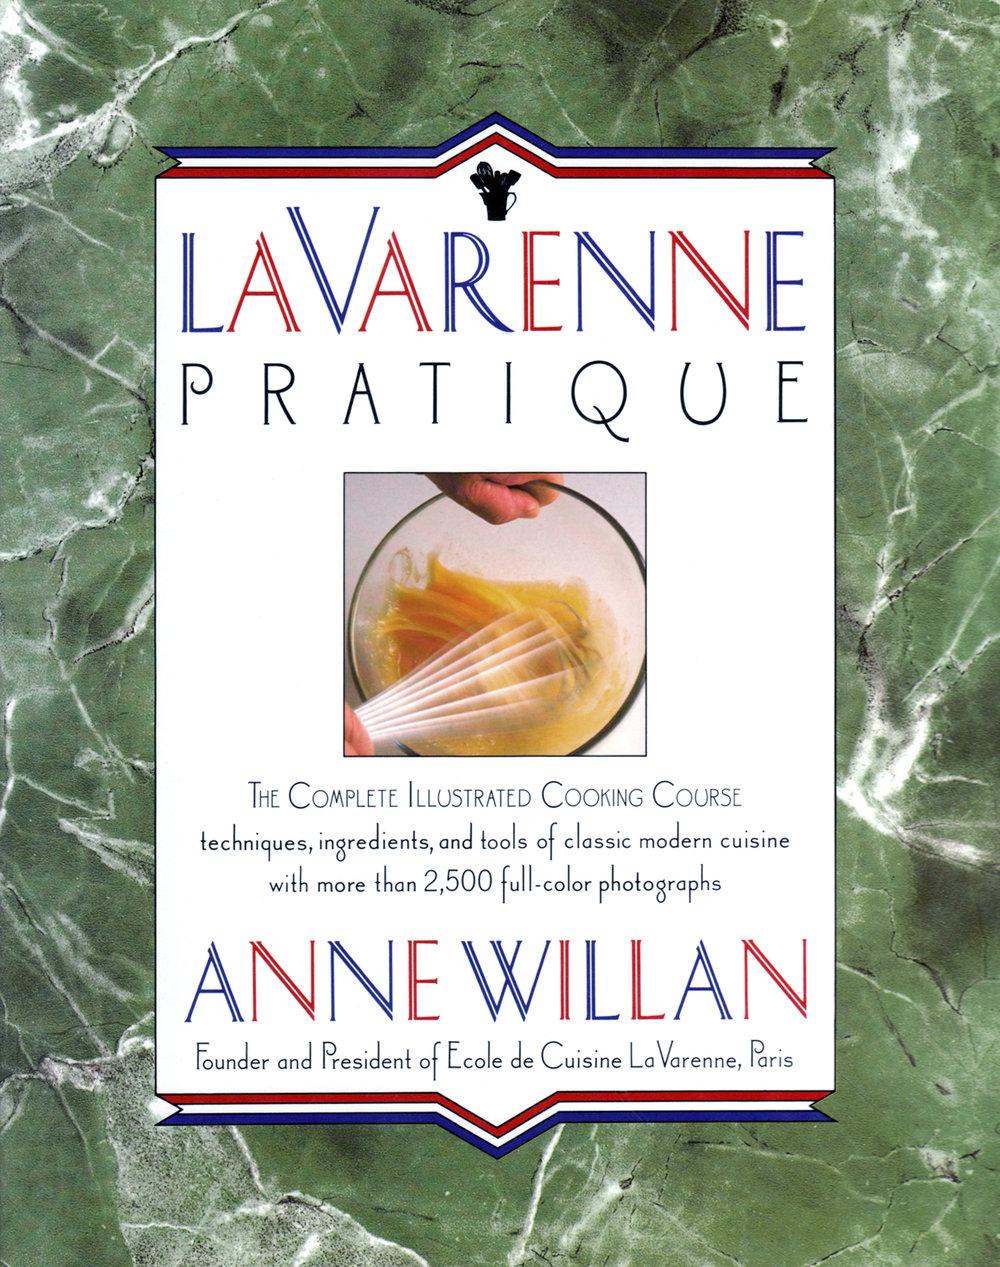 Willan - La Varenne Pratique - 9780517573839.jpg